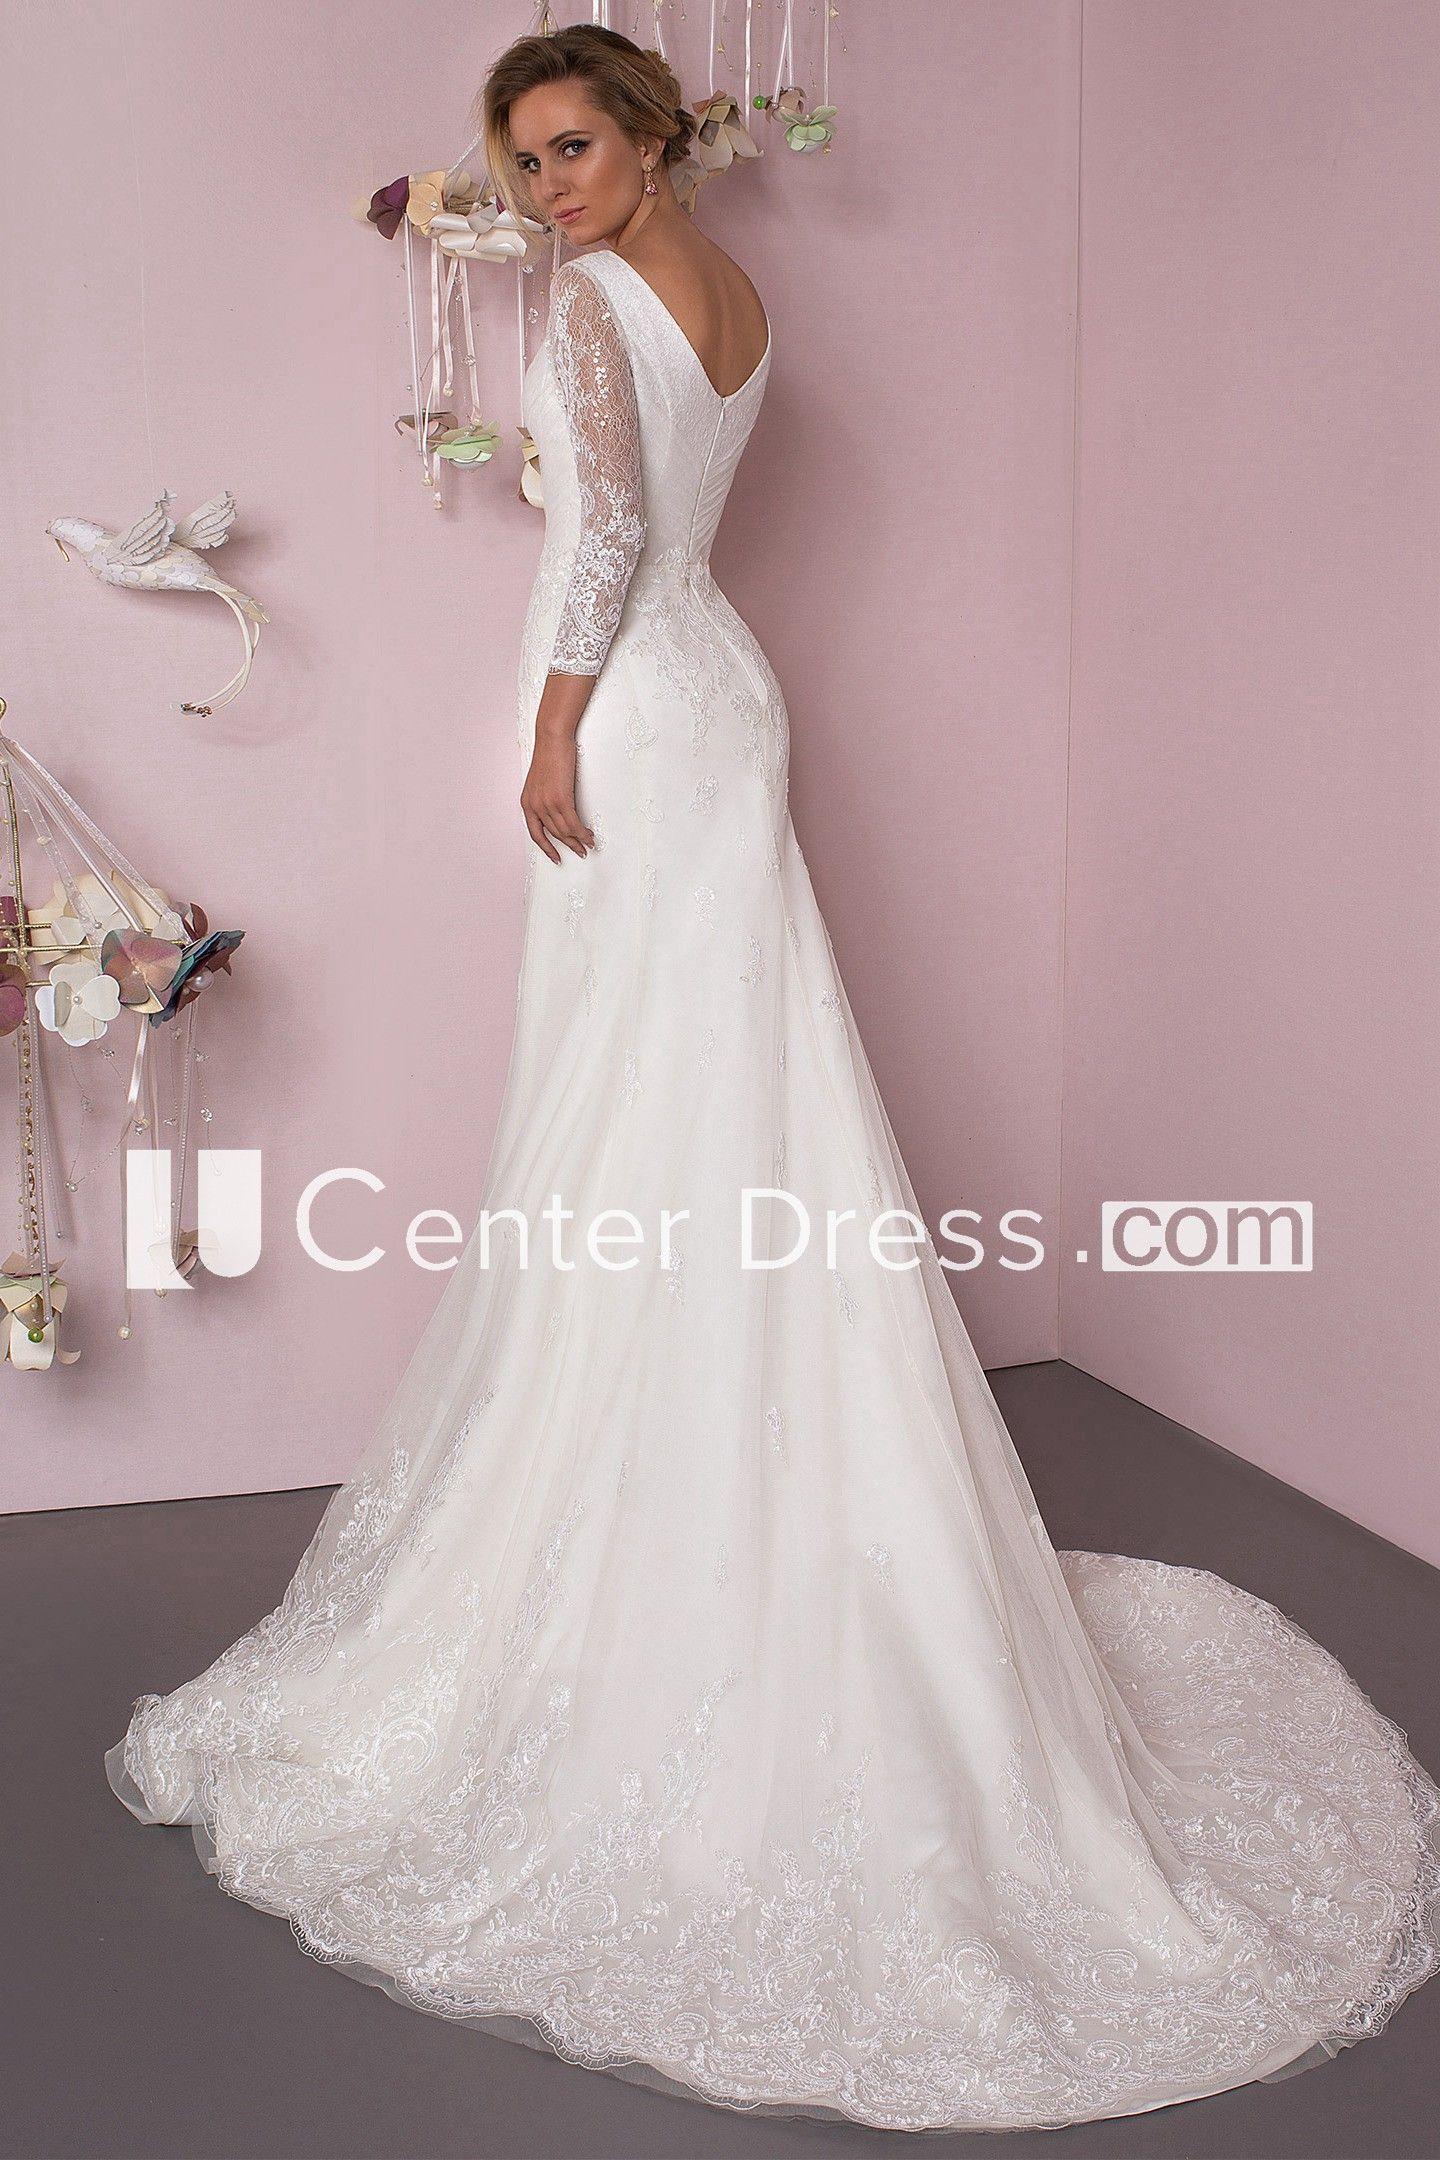 8a81321c6550 Mermaid Floor-Length Appliqued Scoop Neck 3-4 Sleeve Lace Wedding Dress - UCenter  Dress